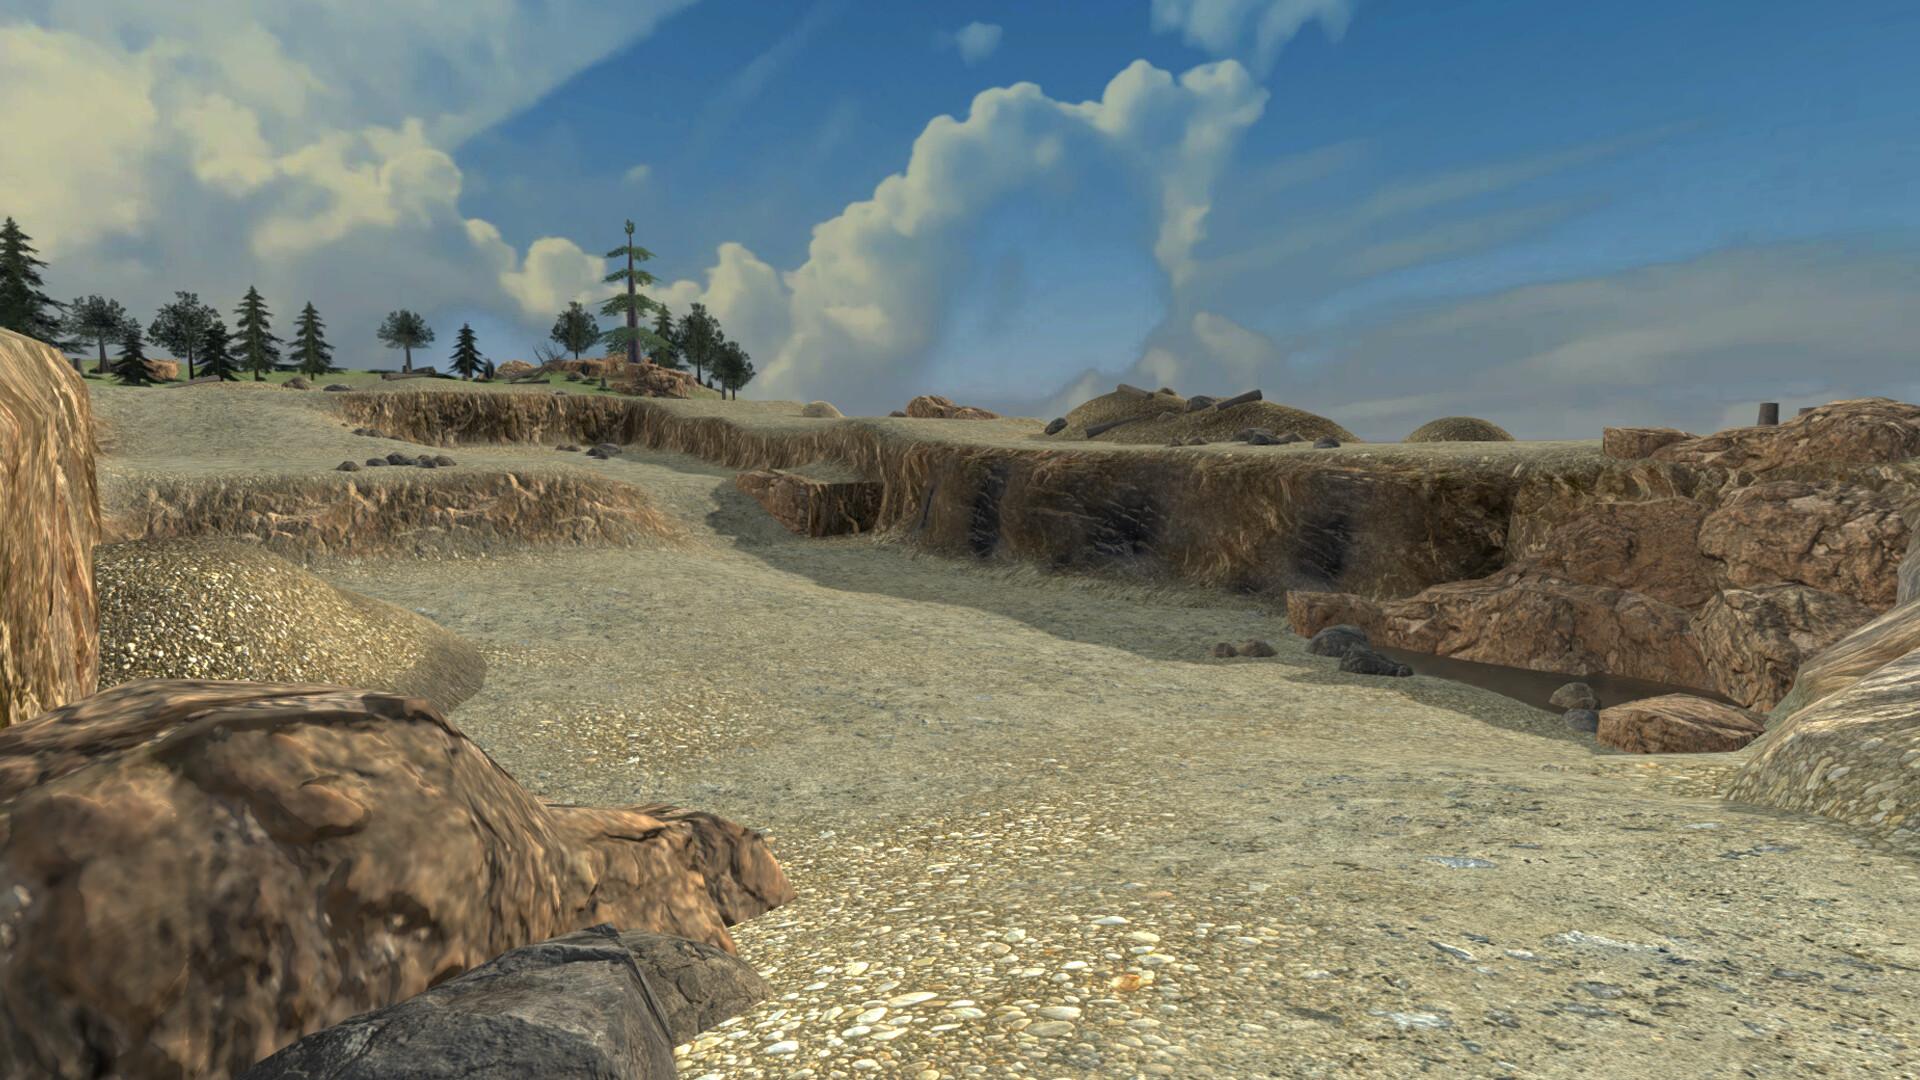 Jordan cameron quarry 1